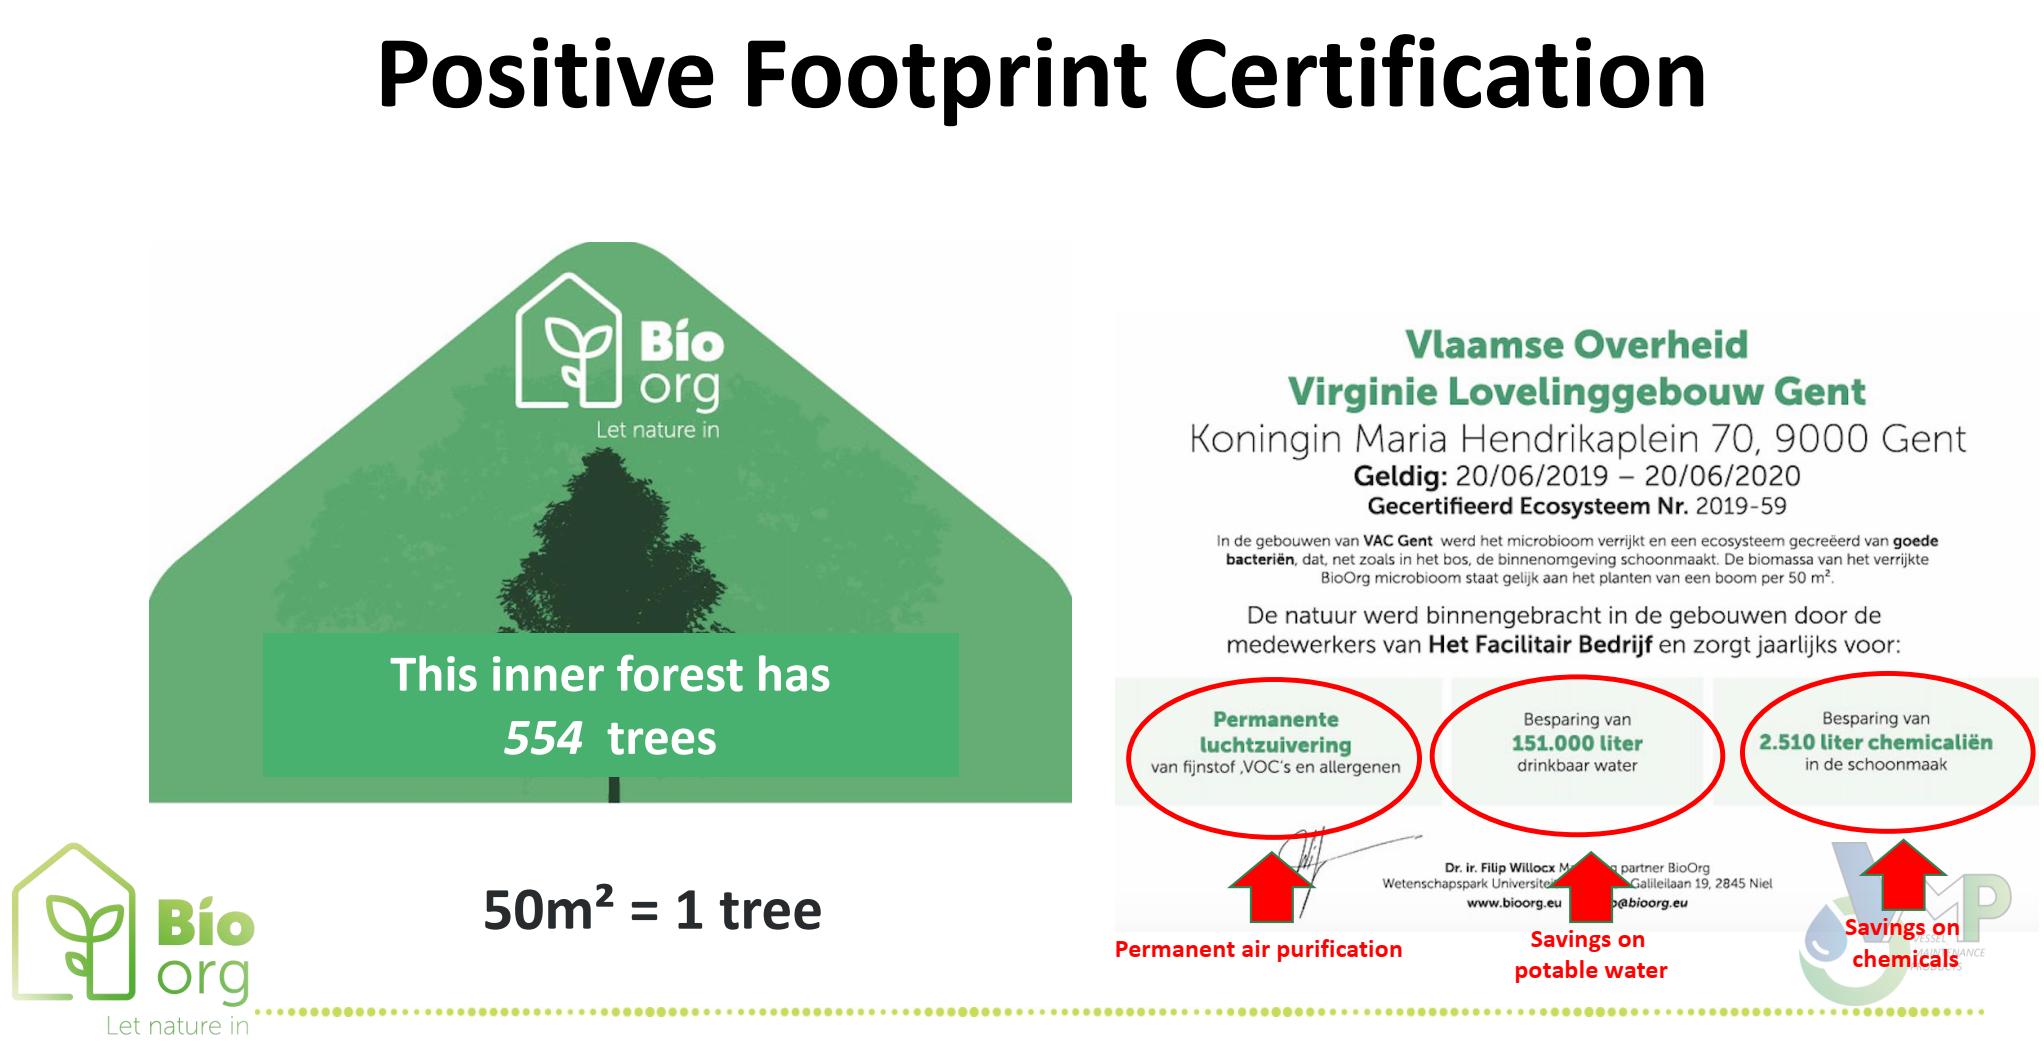 BioOrg Certificate